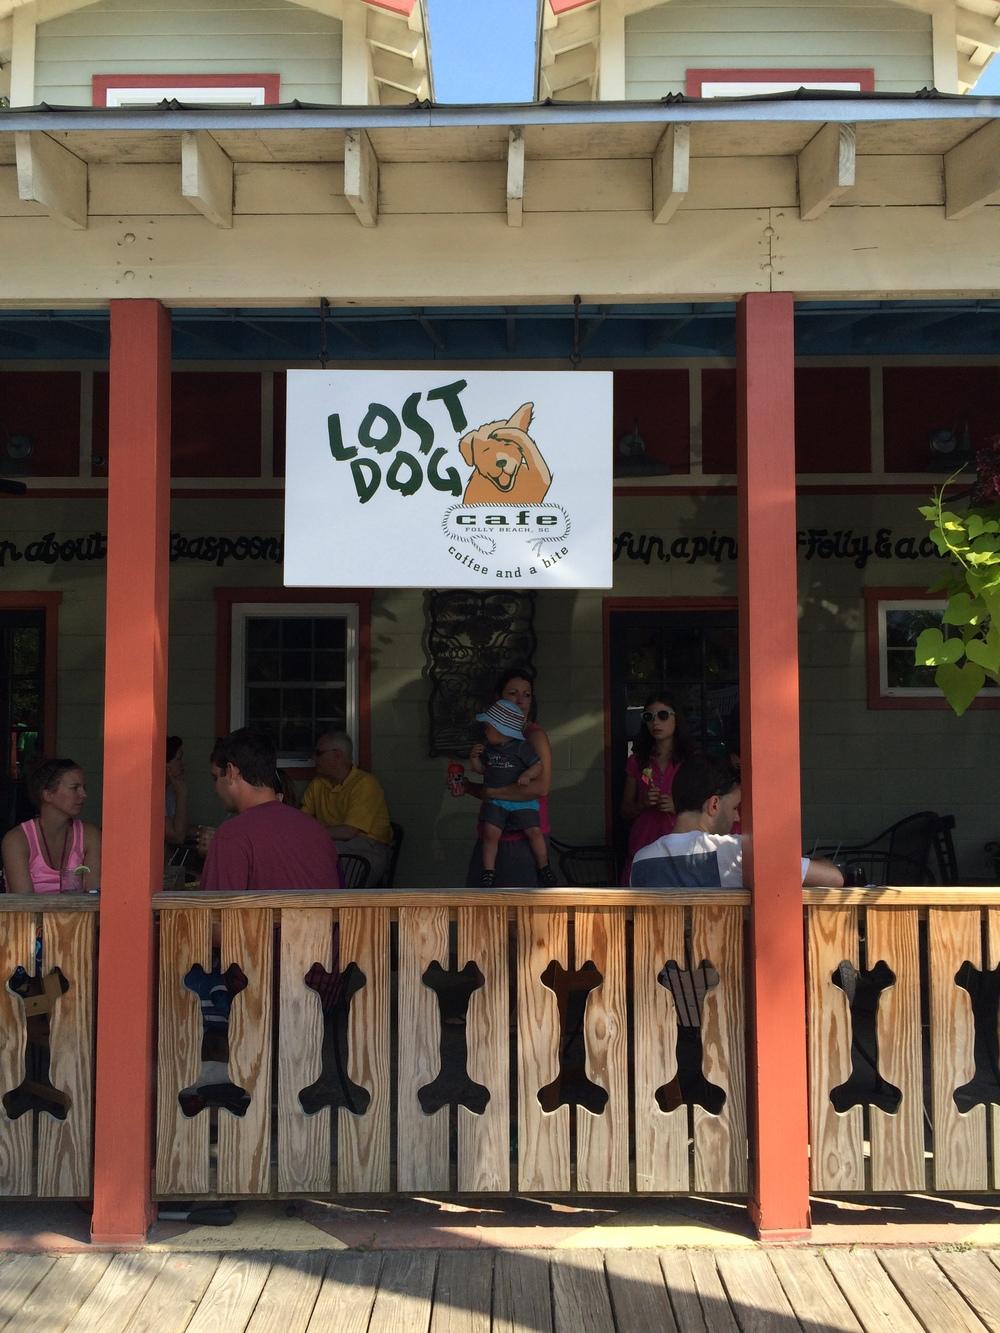 Lost Dog Cafe, Folly Beach